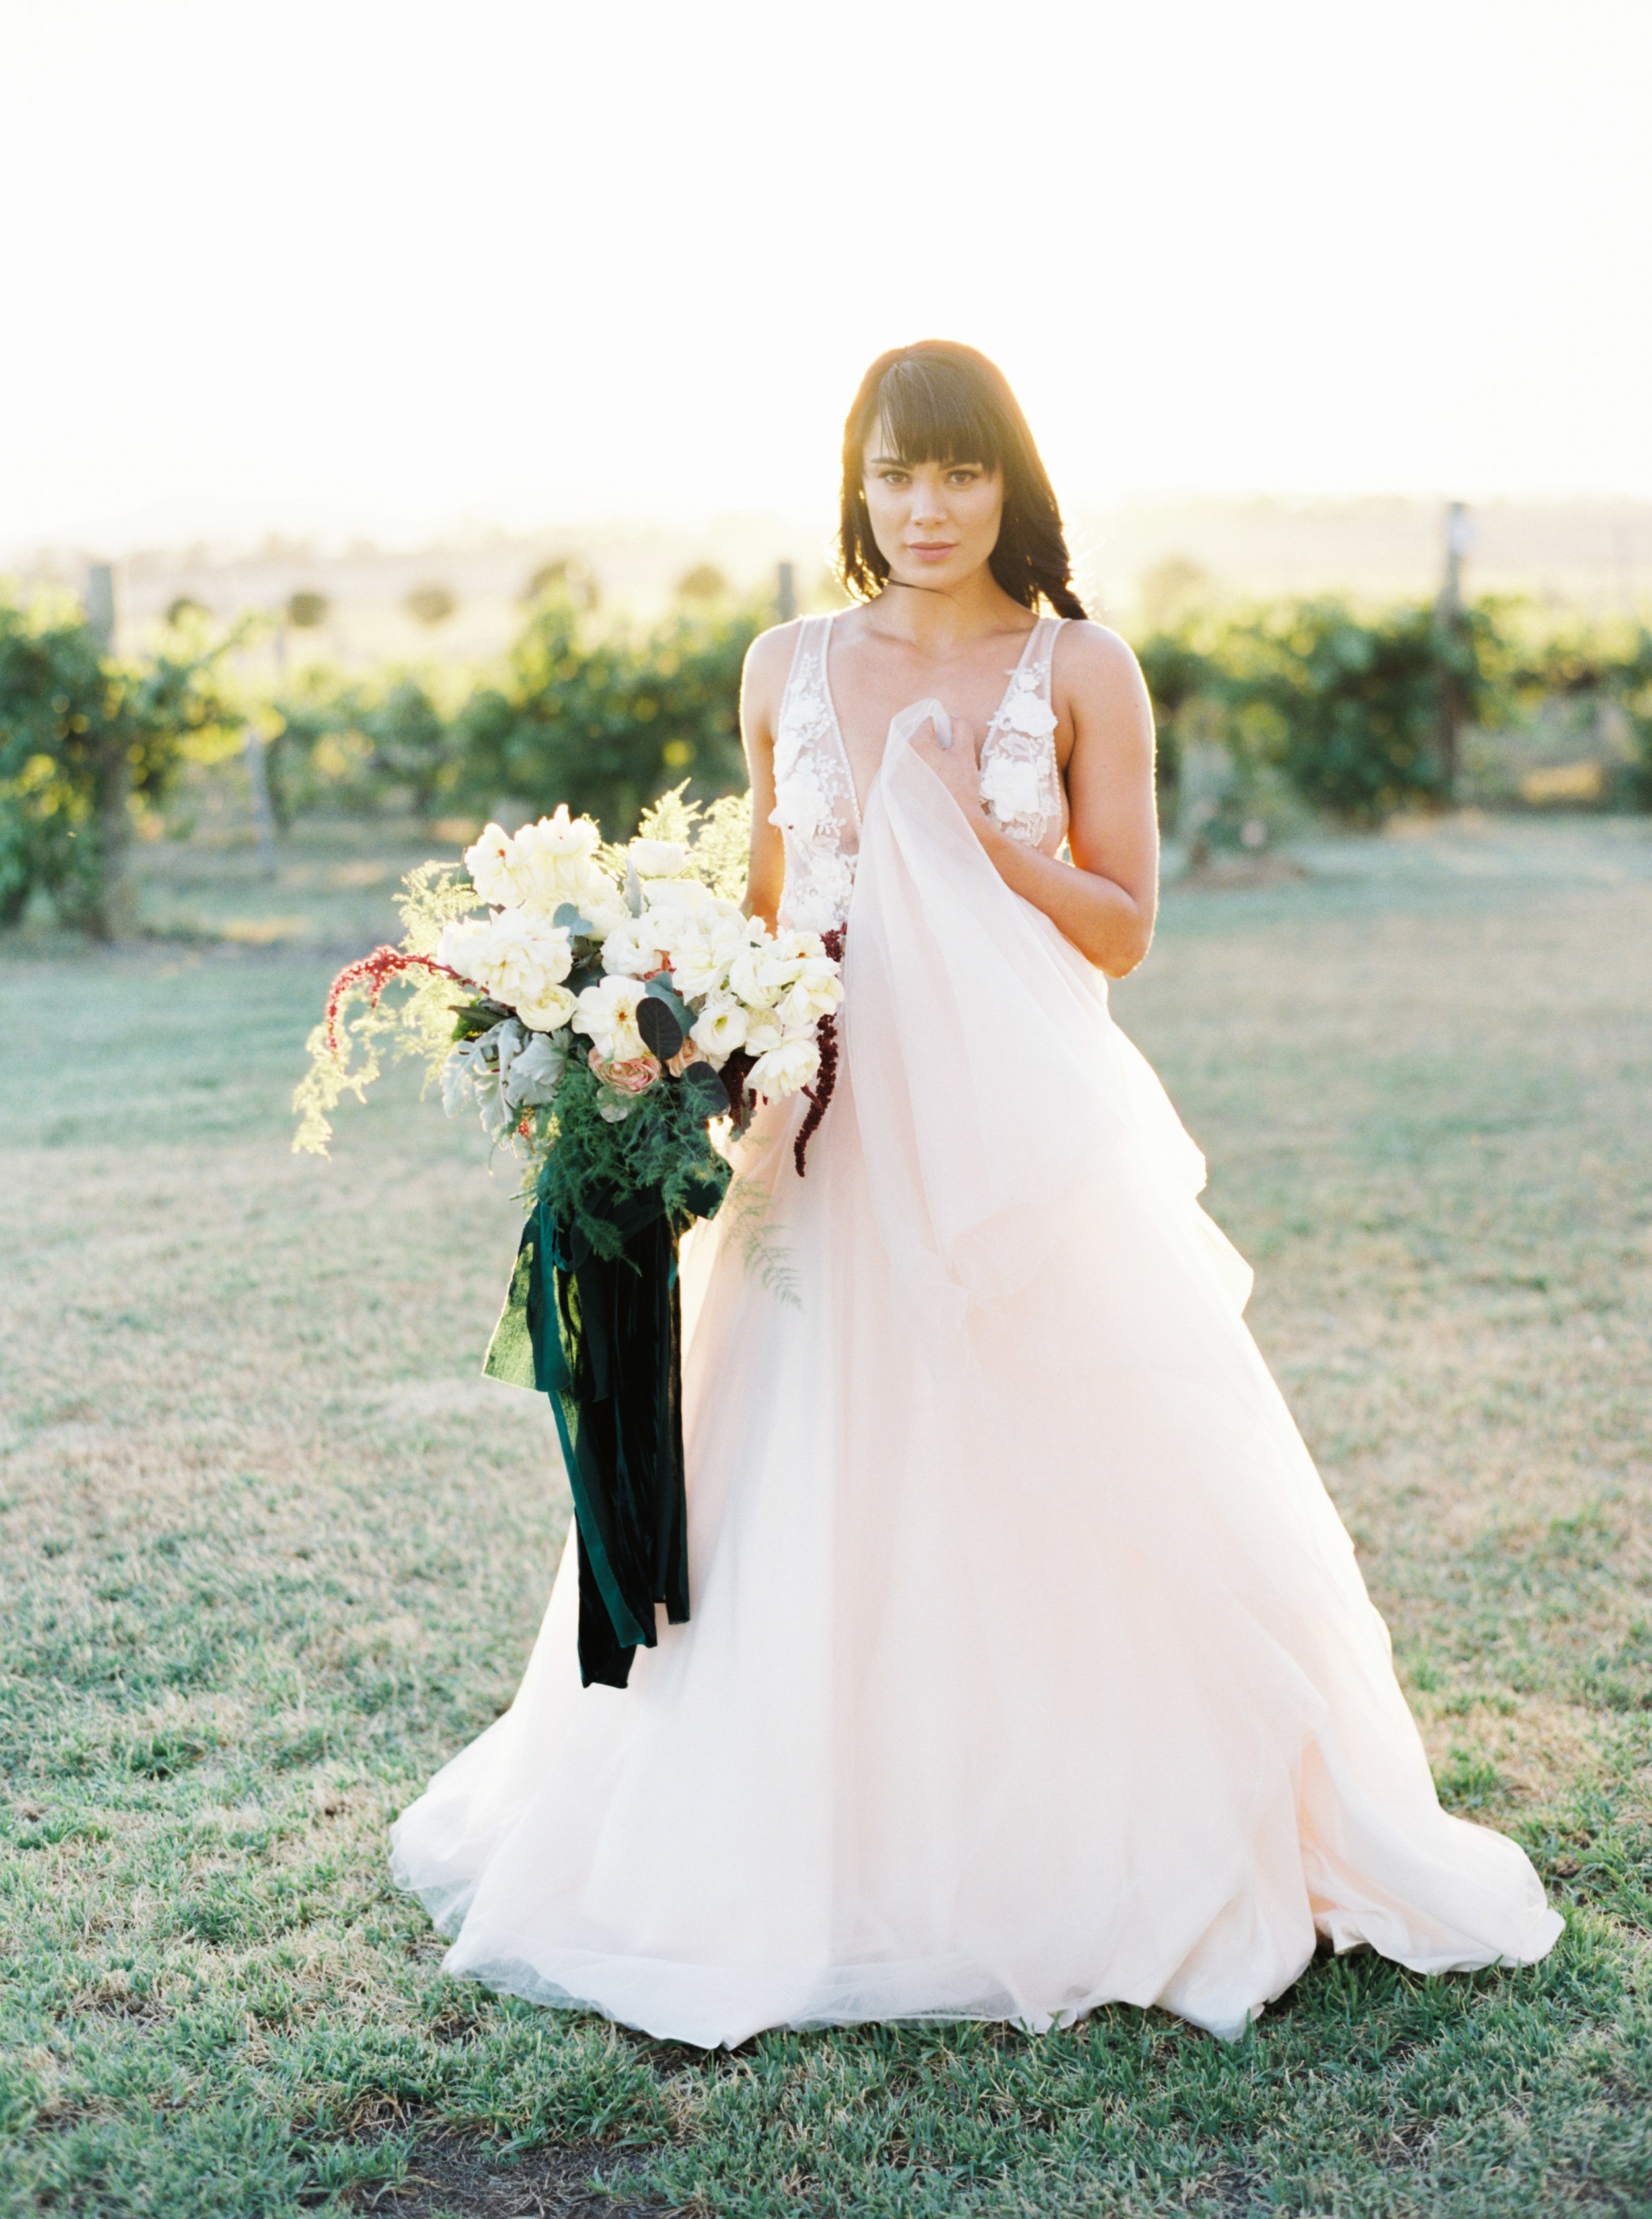 00036- Tamworth NSW Wedding Photographer Sheri McMahon-2.jpg